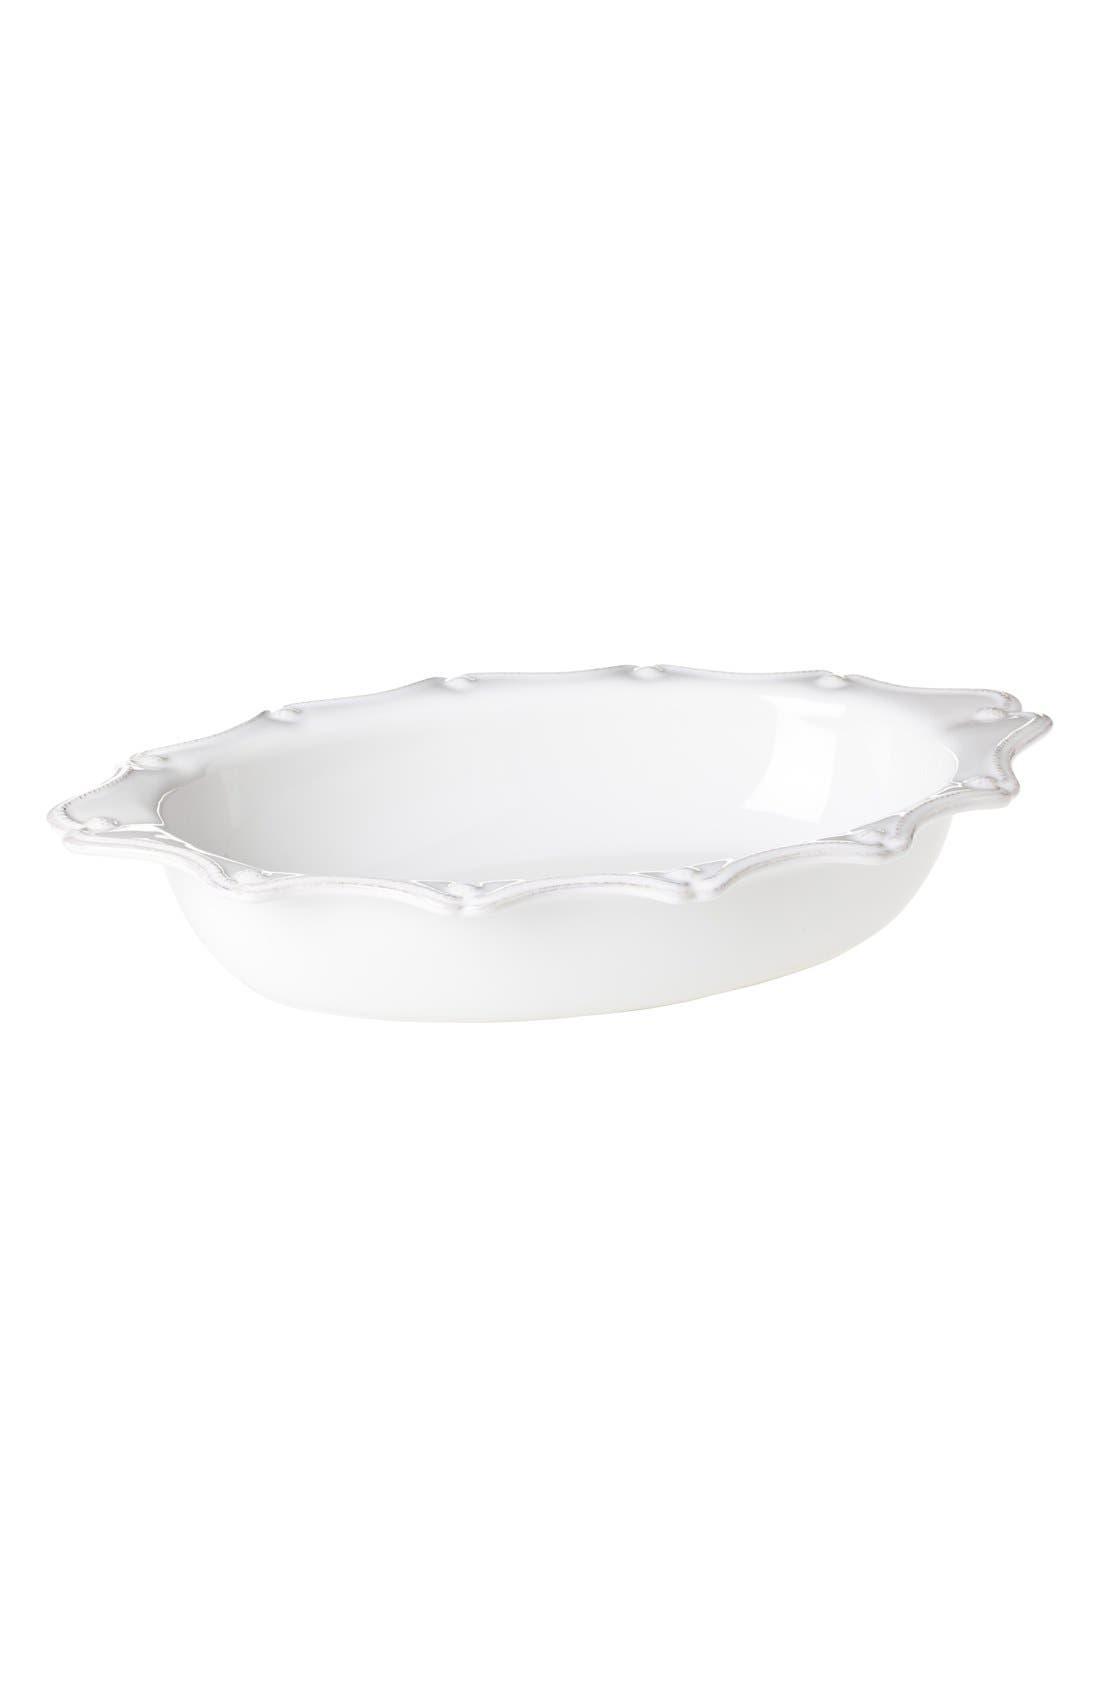 Juliska 'Berry and Thread' Oval Baking Dish